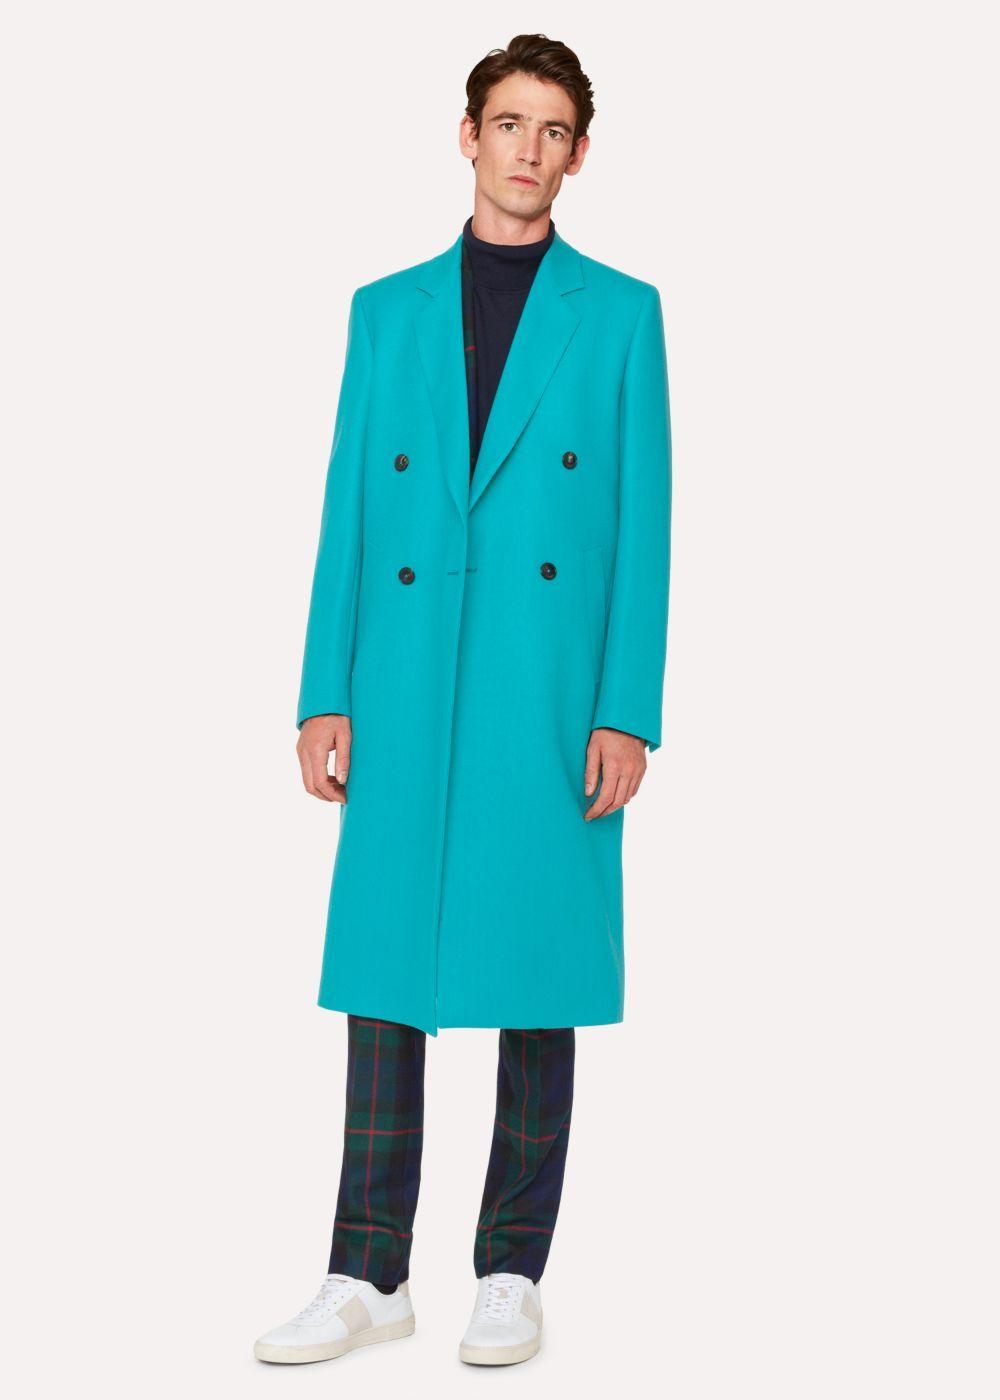 Men S Turquoise Double Breasted Wool Overcoat Paul Smith Designer Jackets For Men Overcoats Jacket Design [ 1400 x 1000 Pixel ]